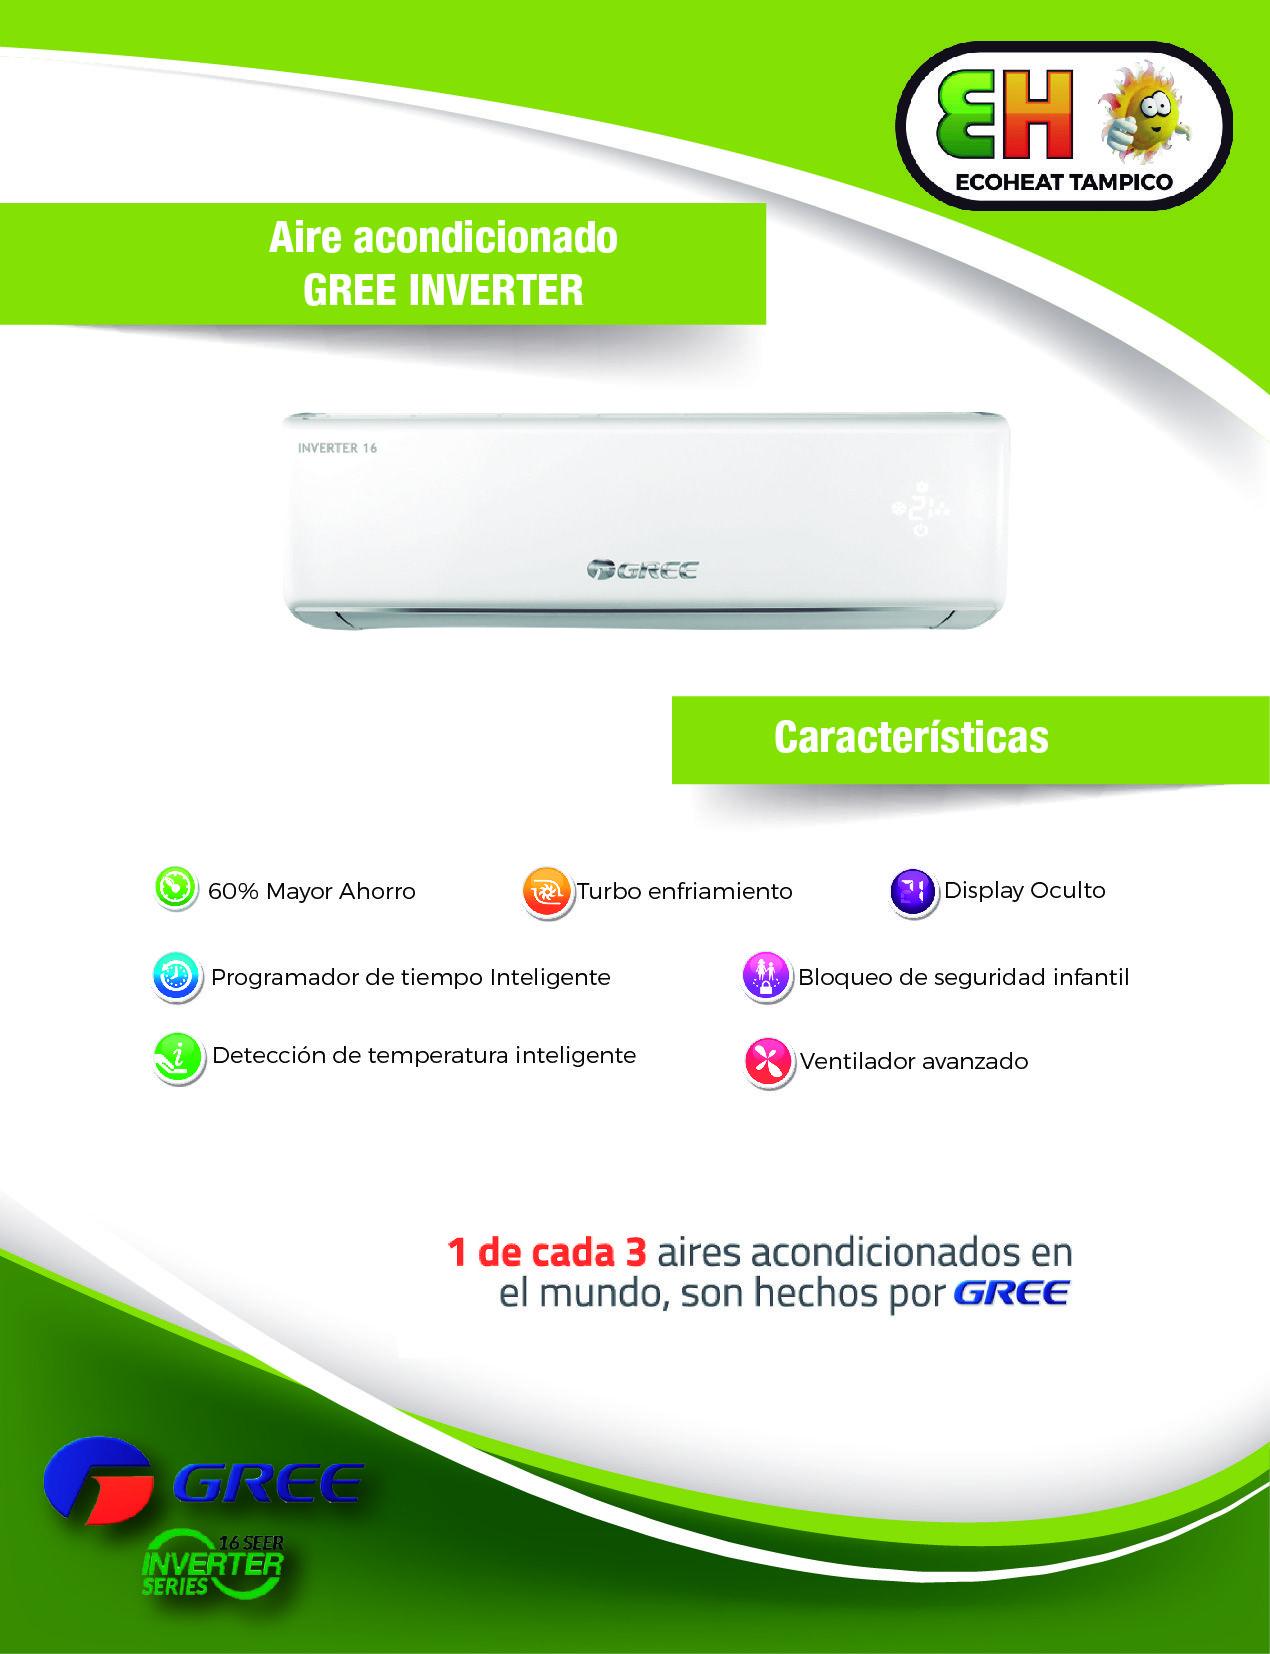 Aire Acondicionado Gree Inverter 1TON 220V 2TON 220V